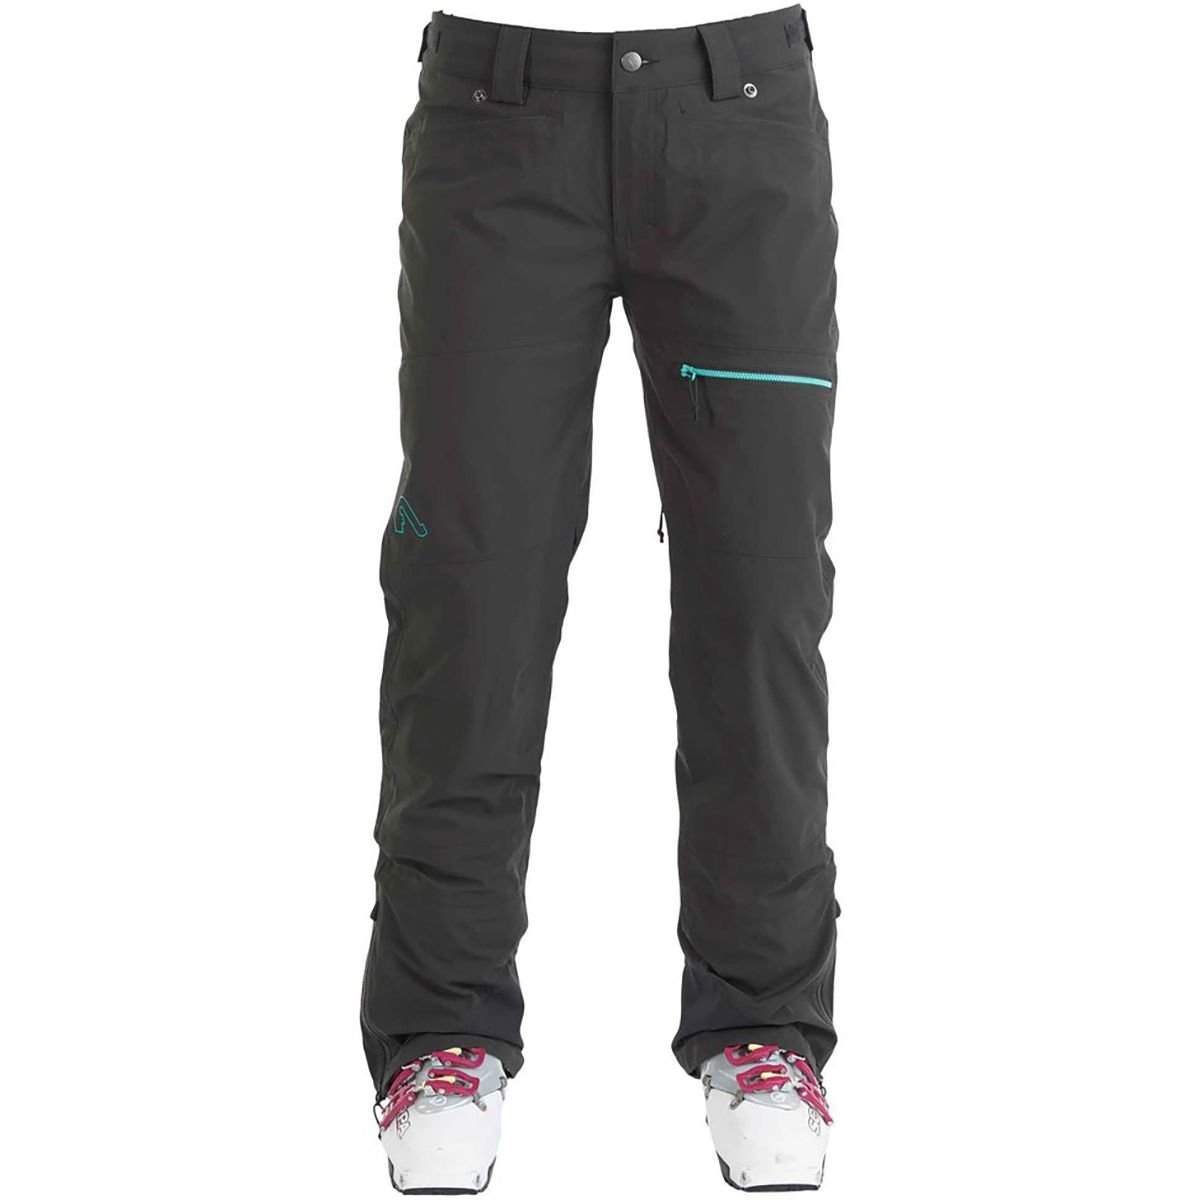 Flylow Sassyfrass Pant – Women 's B073XB3SF3 Small|ブラック ブラック Small